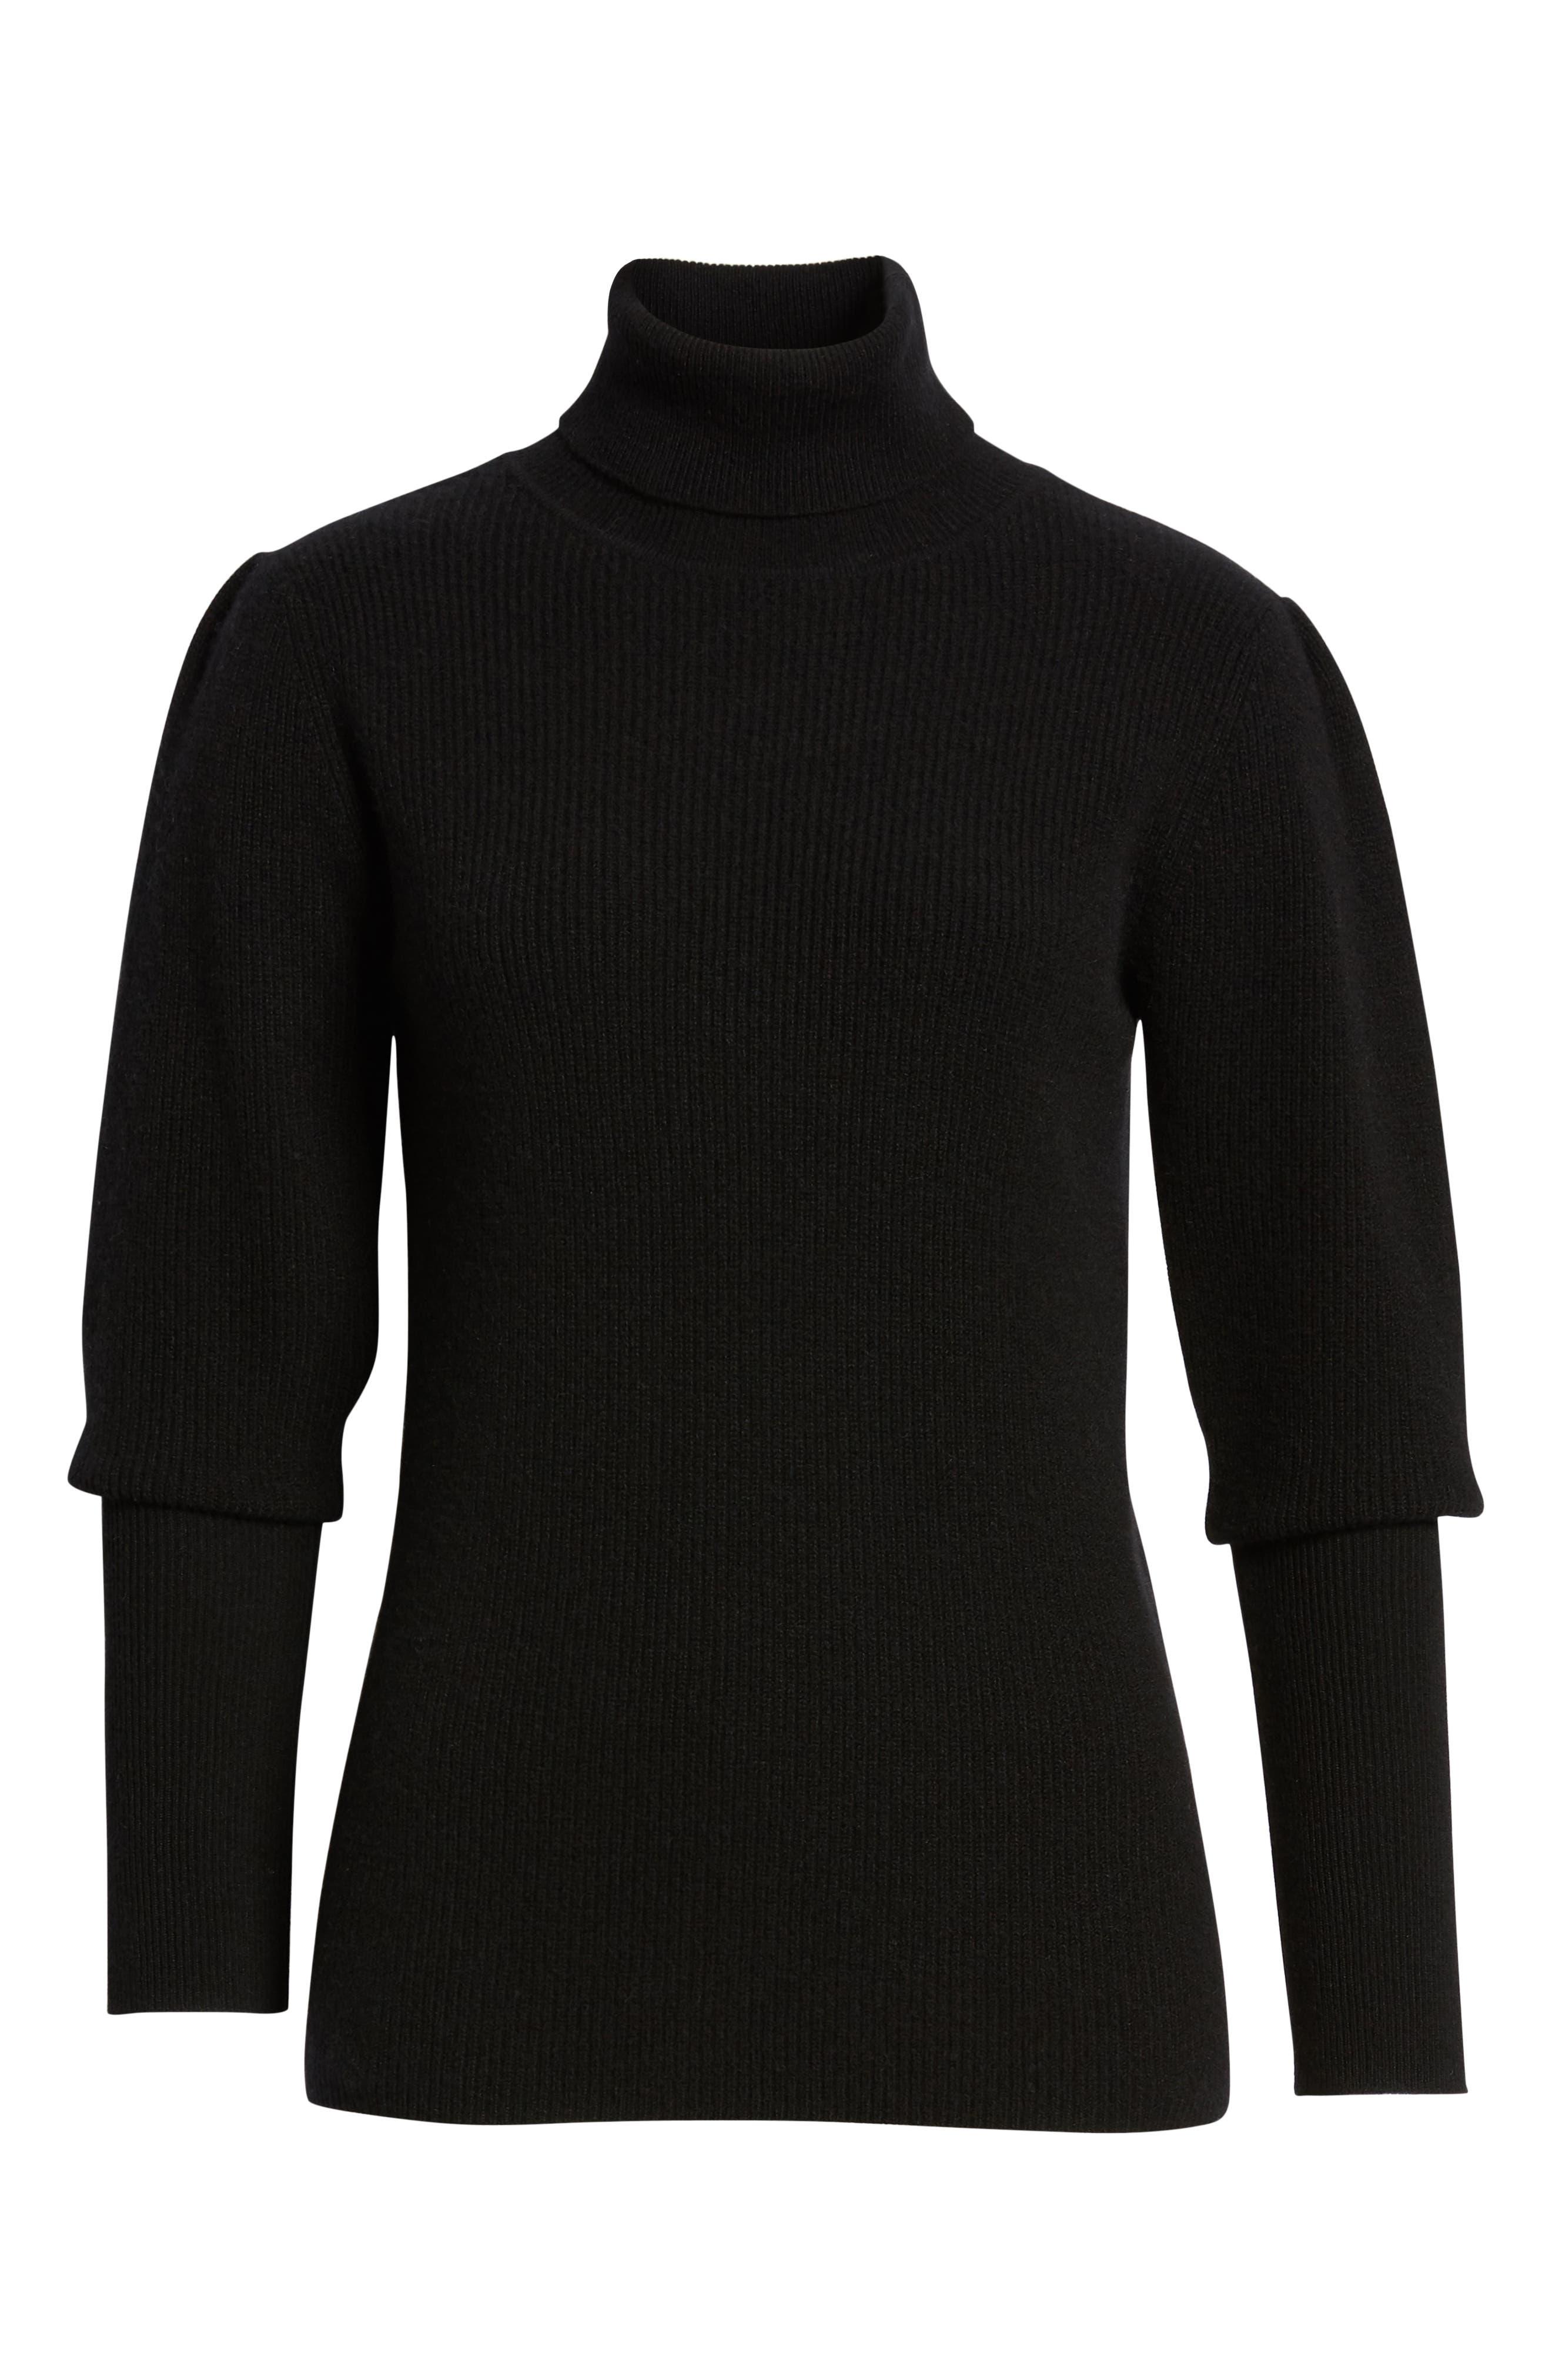 Cashmere Puff Sleeve Turtleneck,                             Alternate thumbnail 6, color,                             BLACK